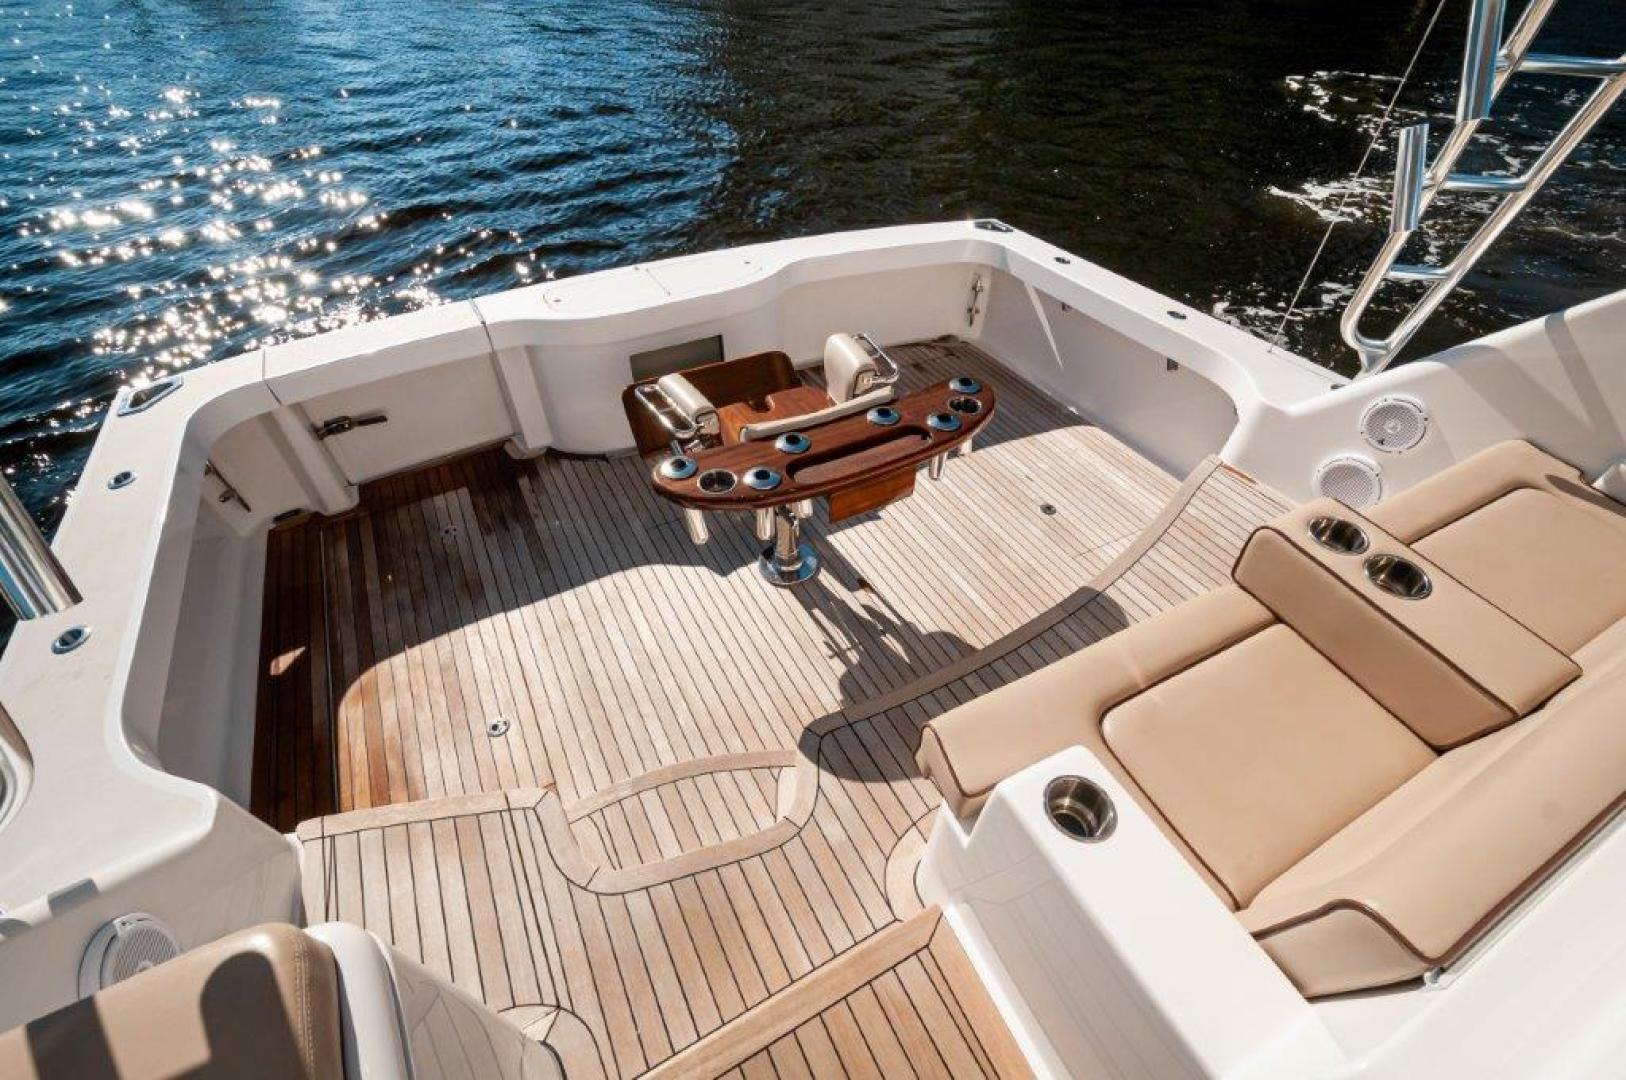 Hatteras-45 GT45X 2016-Badonkadonk Biloxi-Mississippi-United States-2016 45 Hatteras GT45X Badonkadonk Cockpit (2)-1549476 | Thumbnail